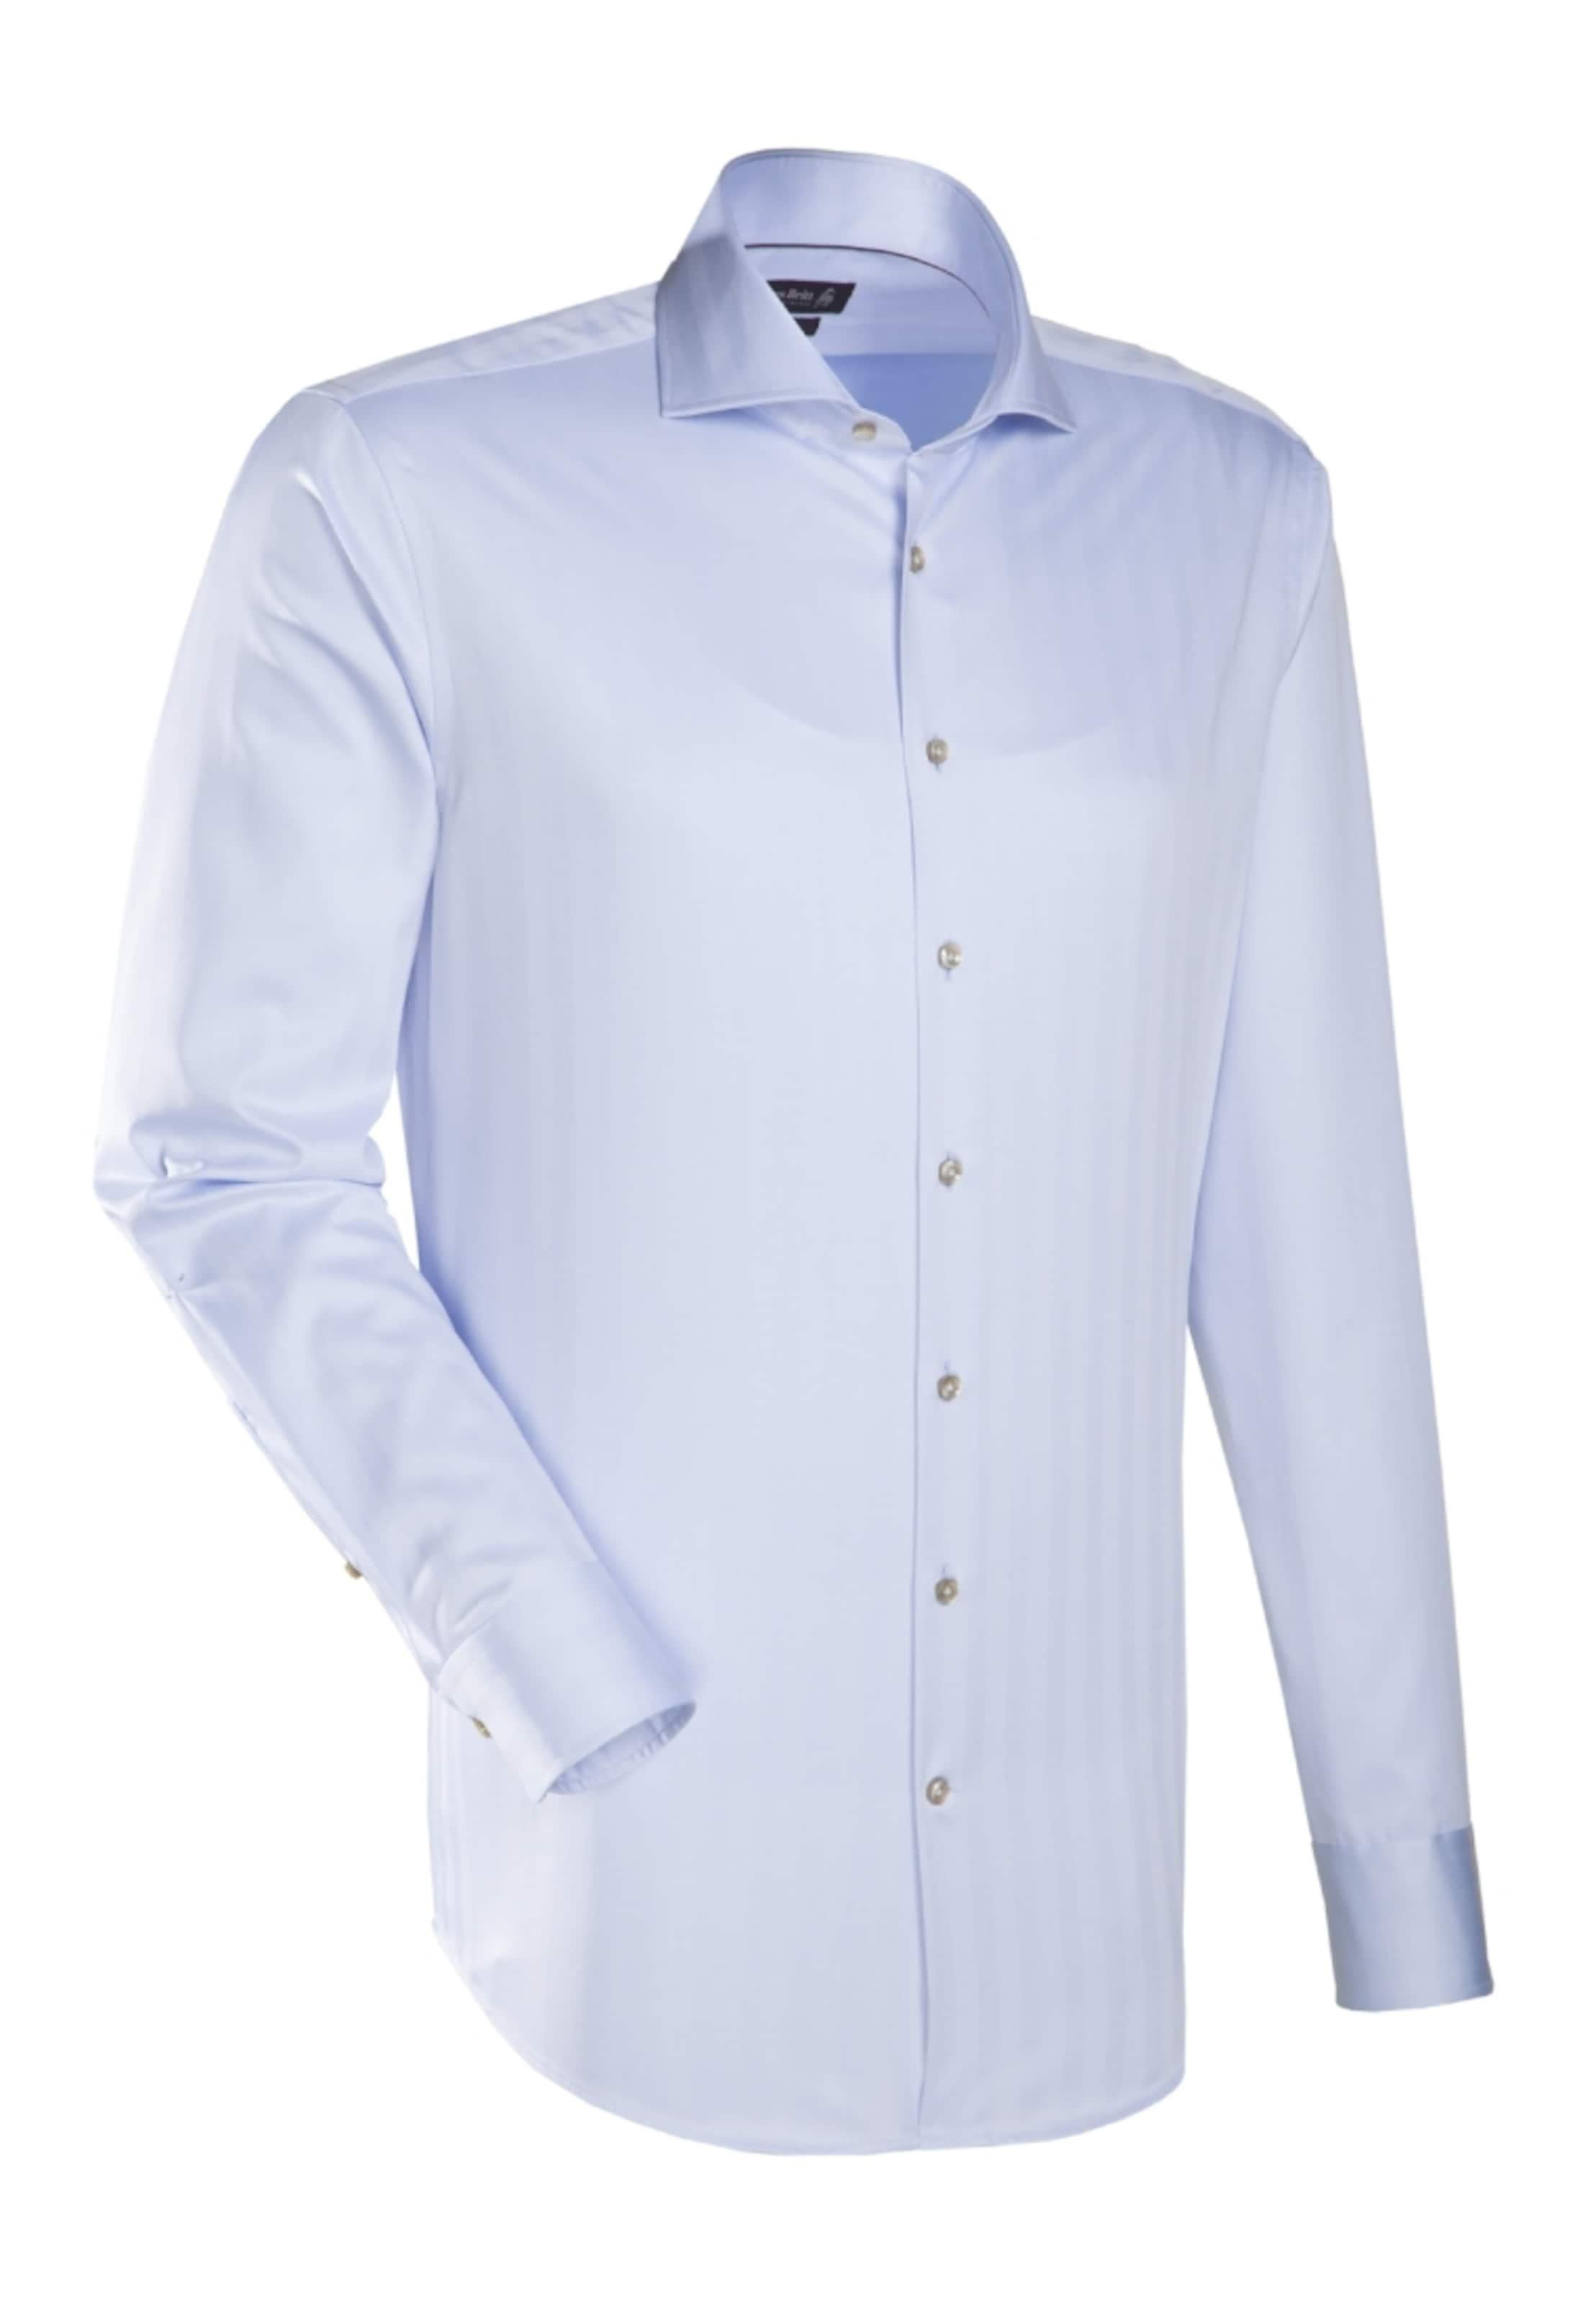 Britt ' Label hemd Jacques In Brown City Blau ZuOkiTwPXl